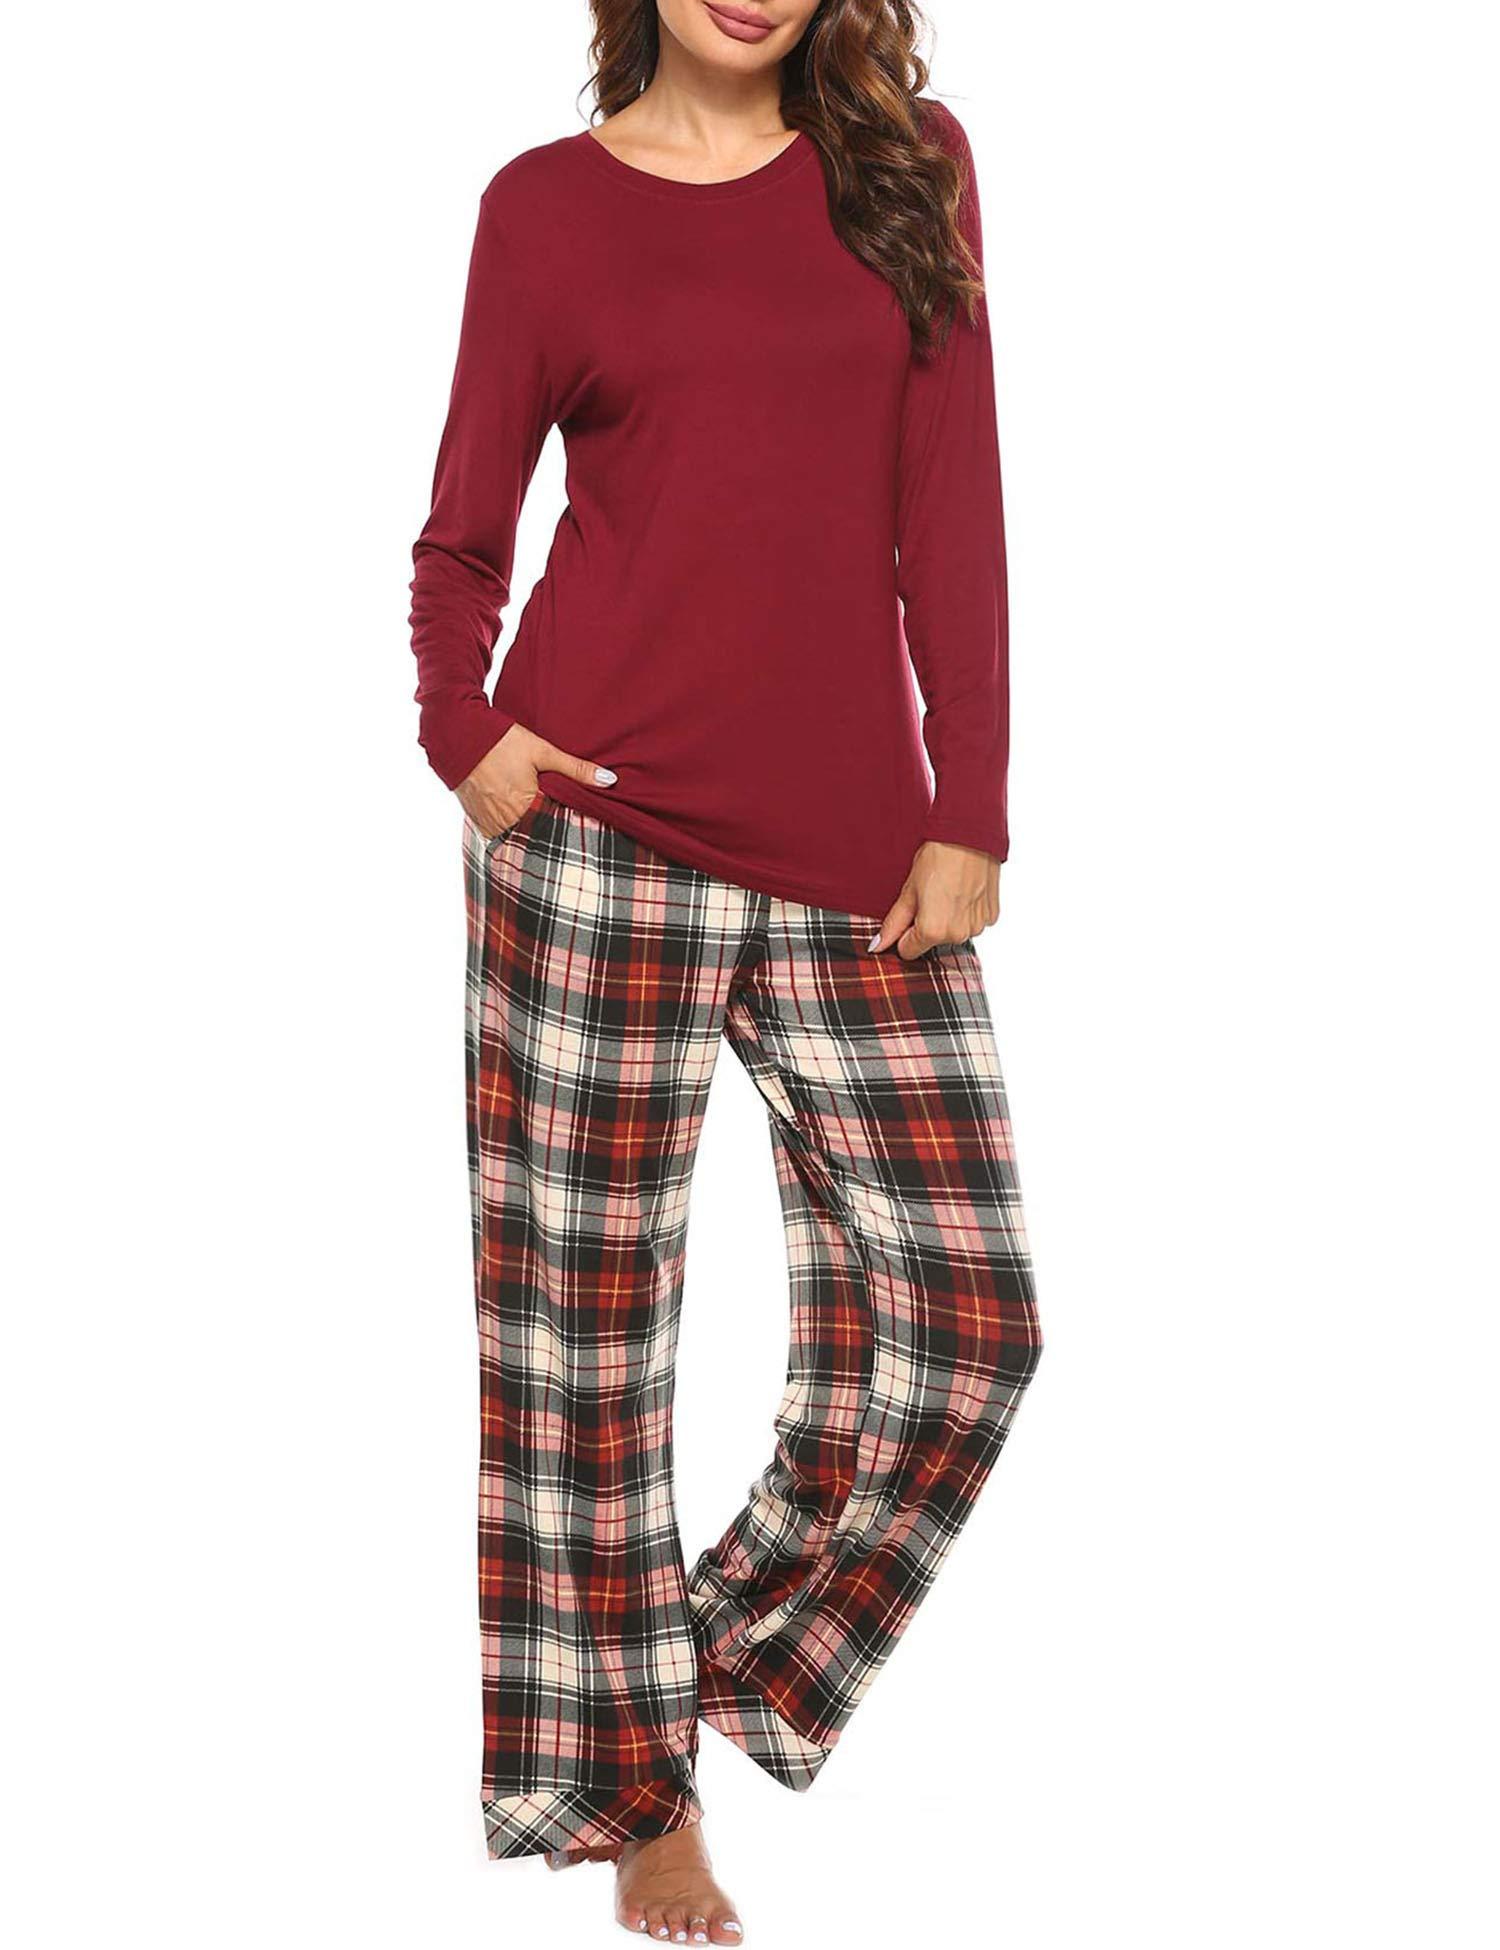 YAWOVE Womens Pajama Set Plaid Long Sleeve Top & Pants Cotton Pjs Sets Sleepwear S-XXL